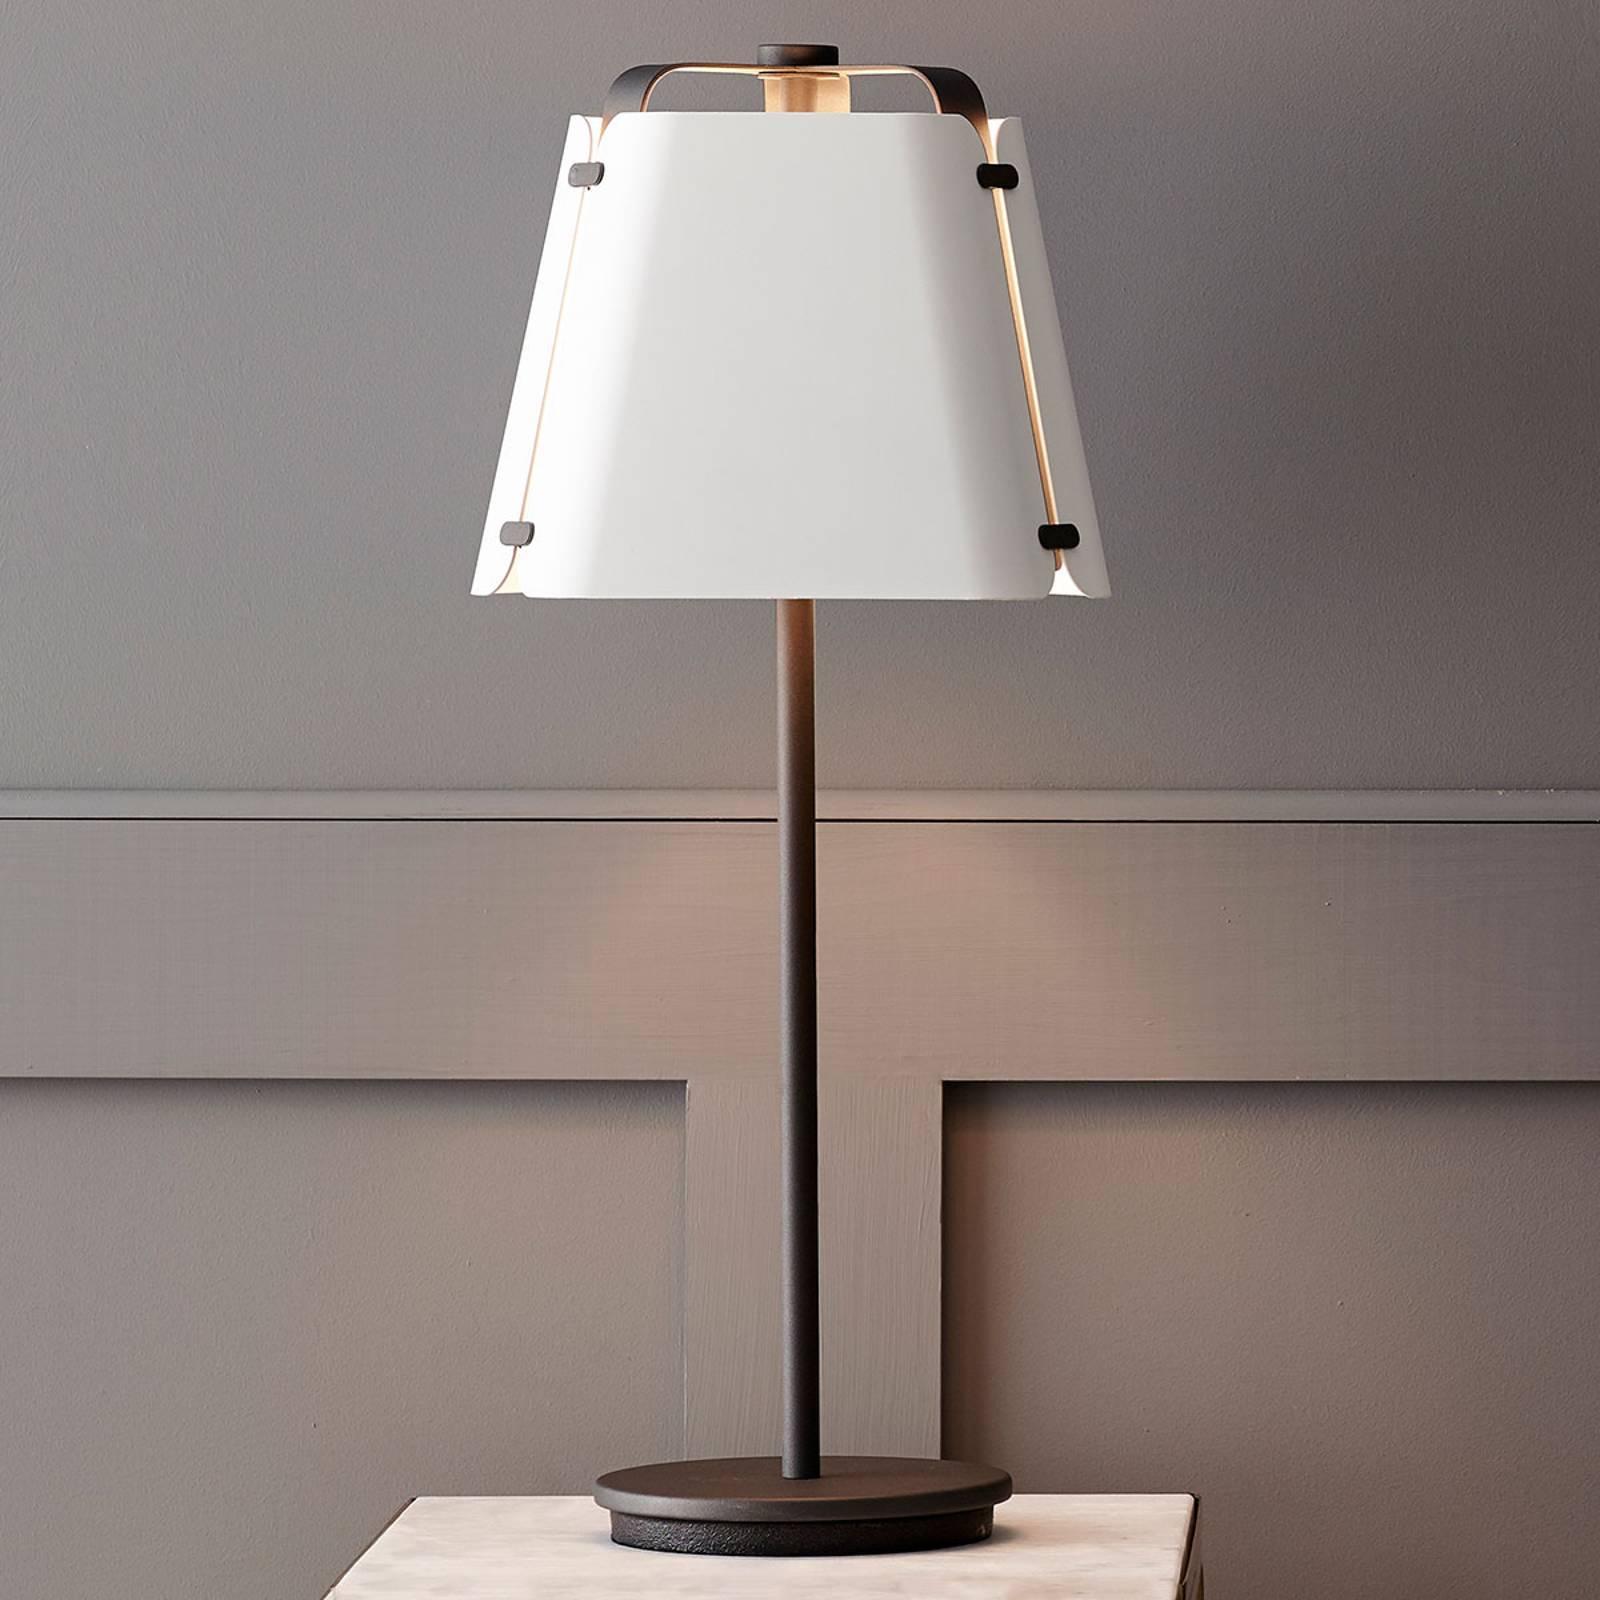 Metalen tafellamp Fold